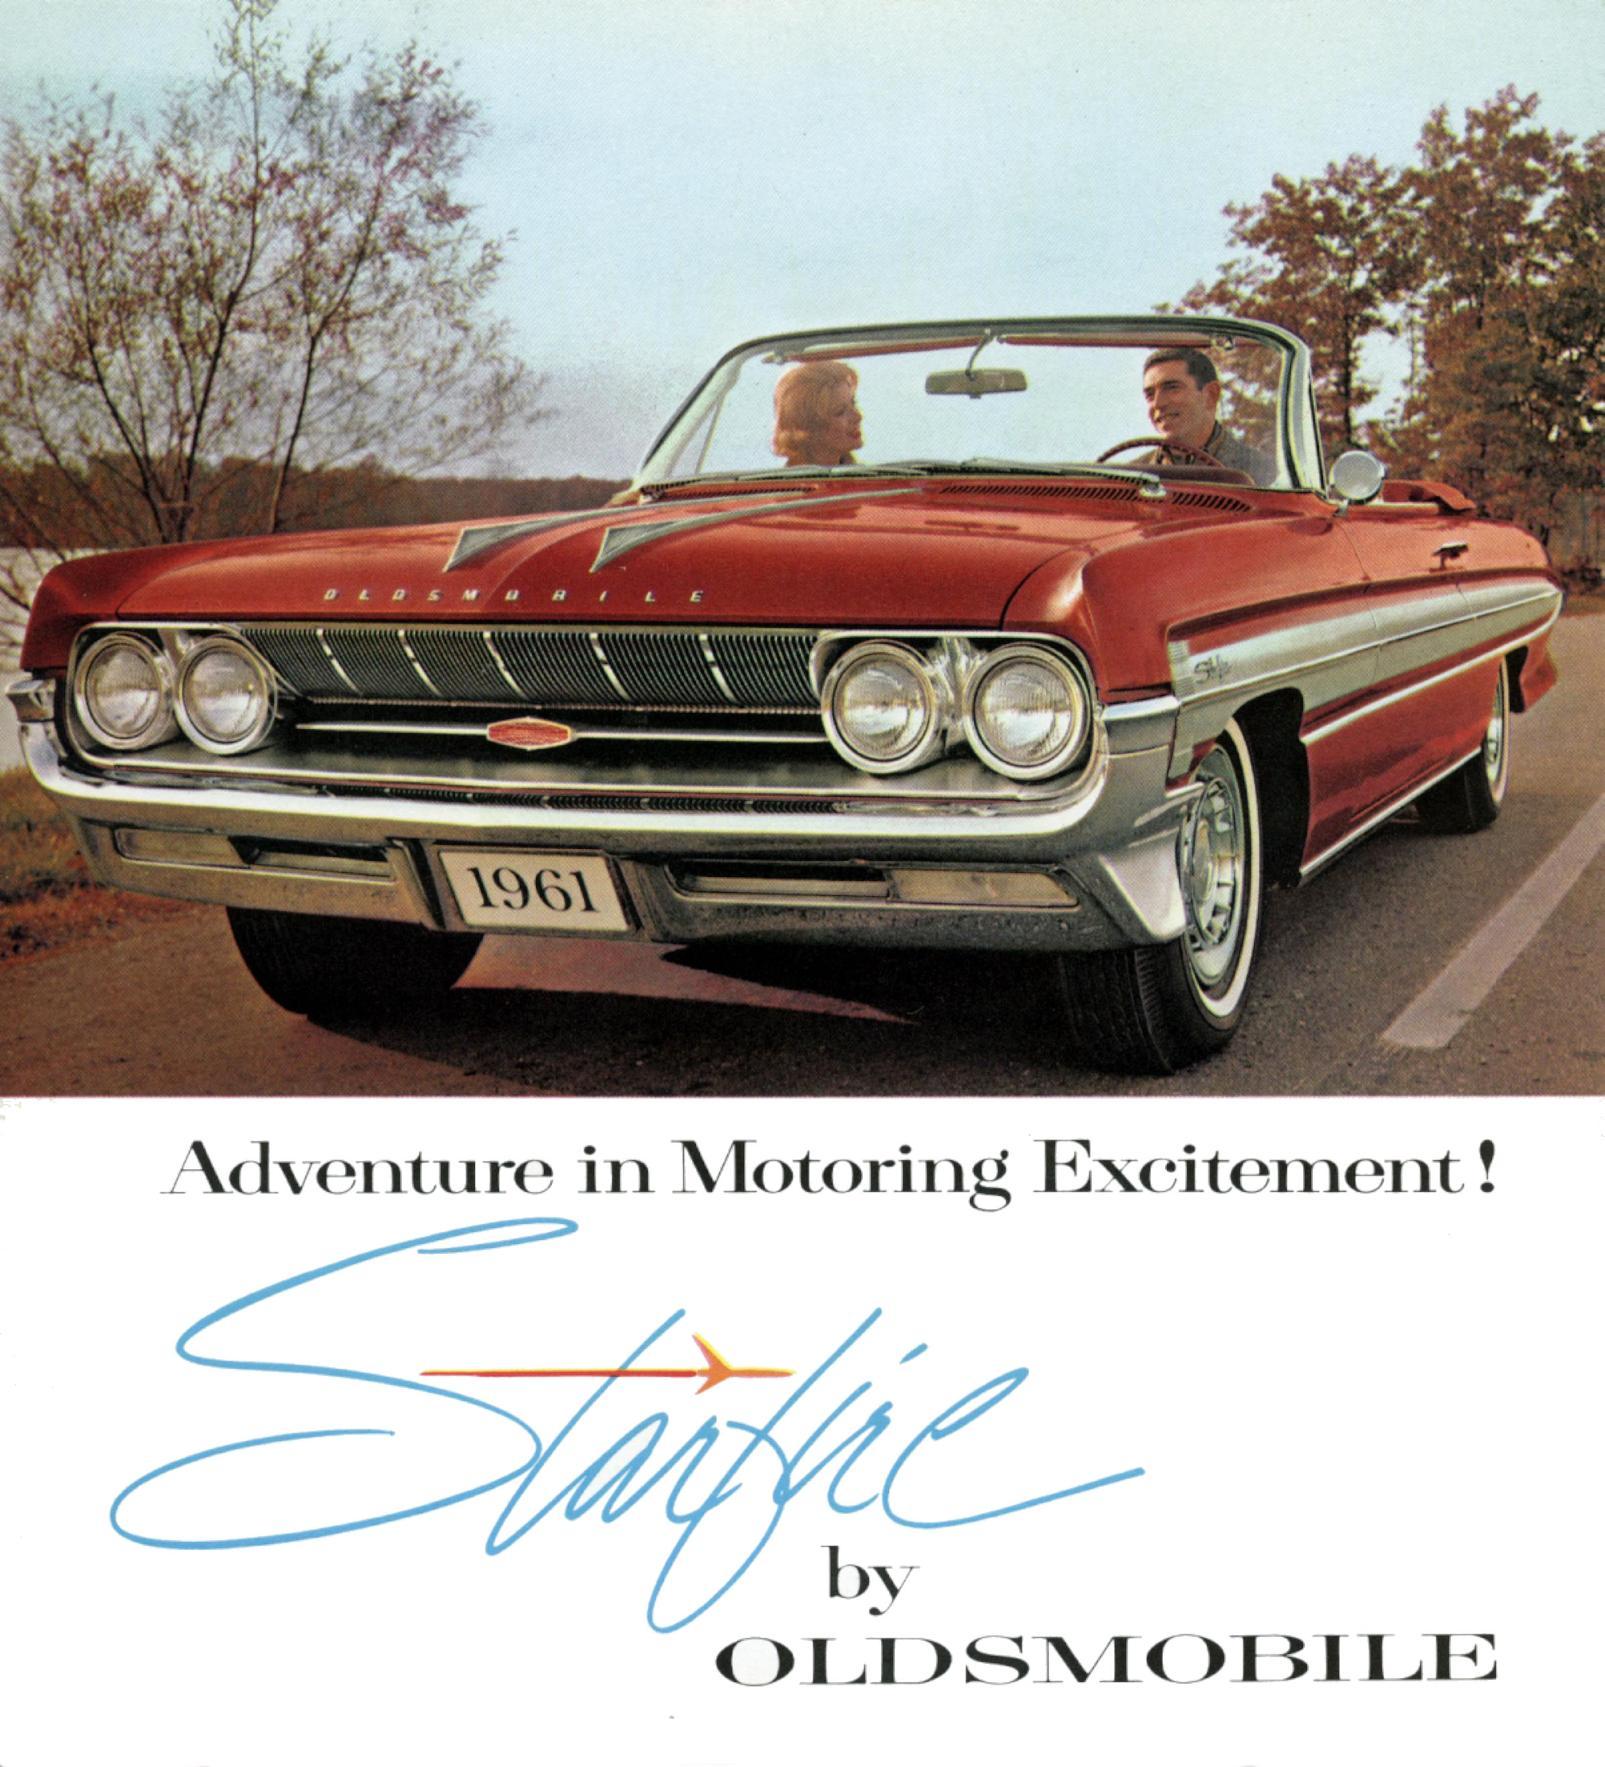 1961 Oldsmobile Starfire brochure